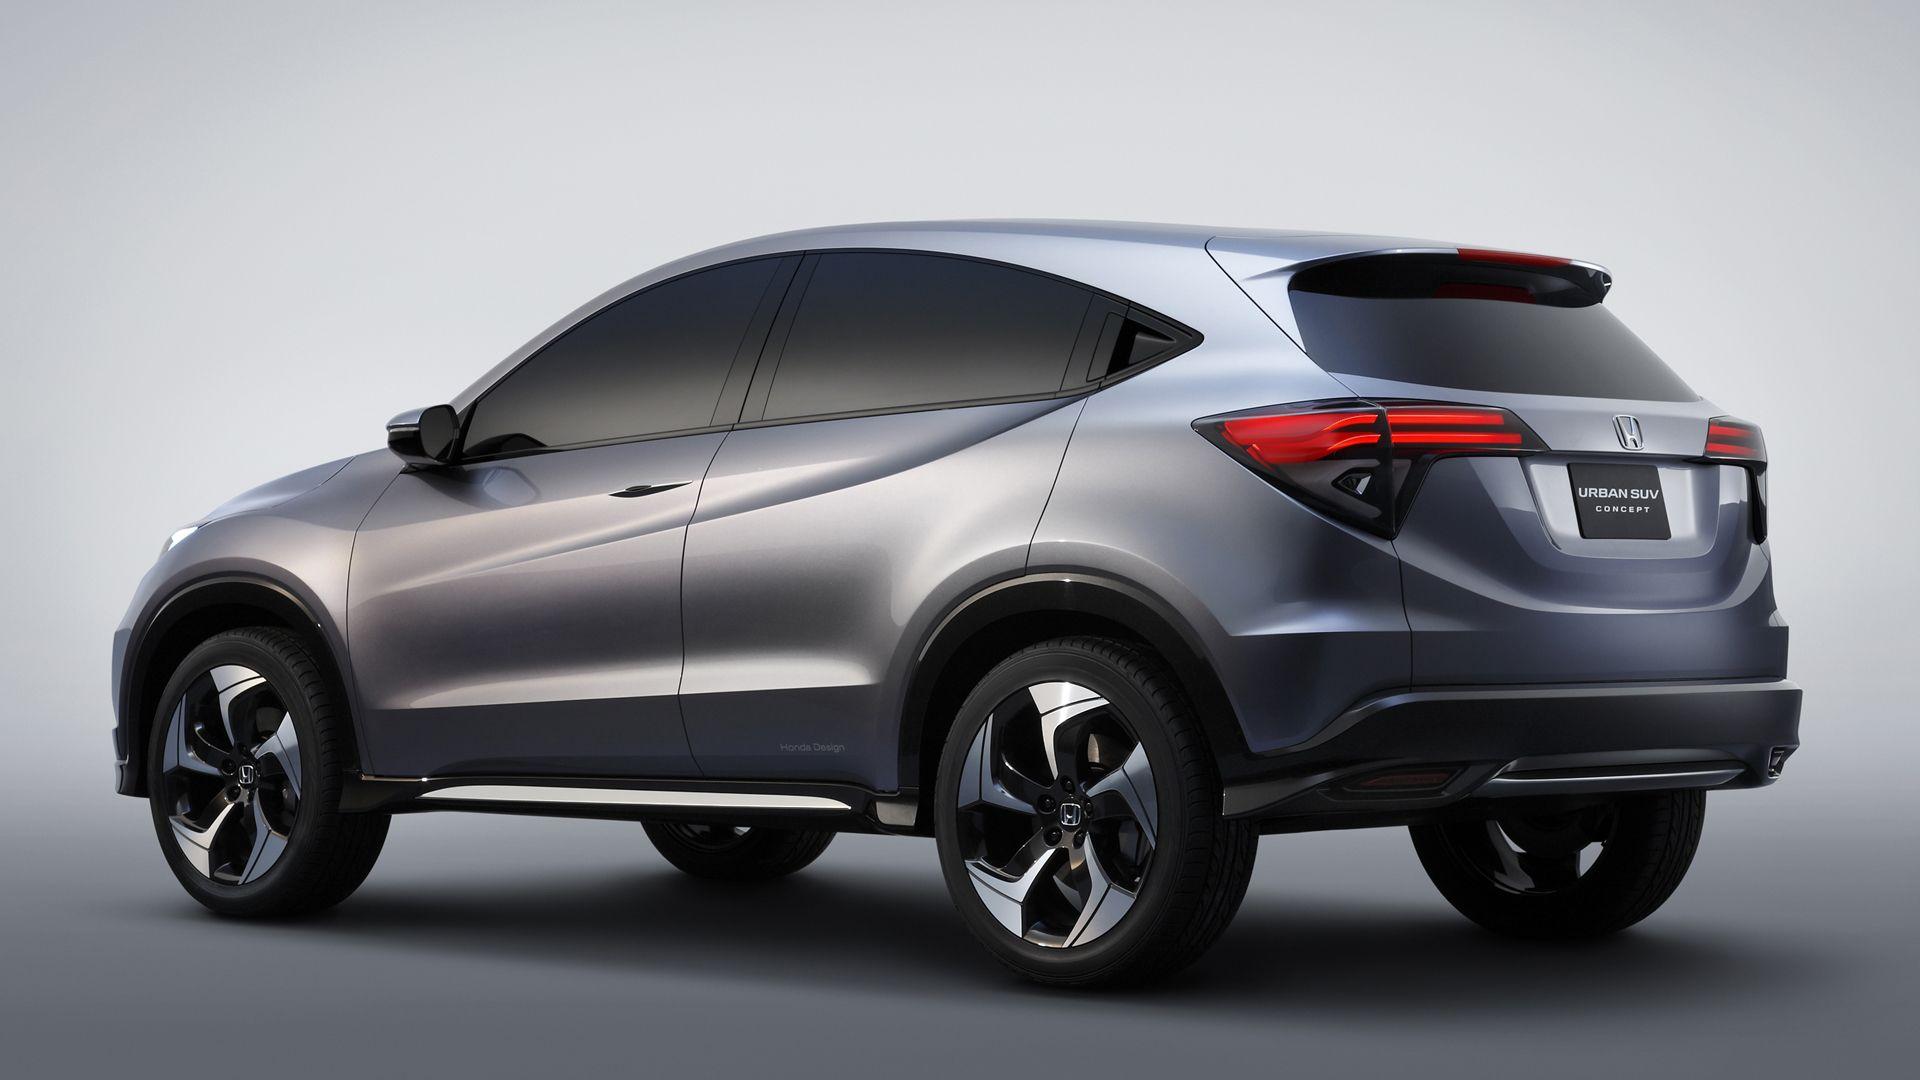 Honda shrinks, sculpts CRV for new concept Honda pilot